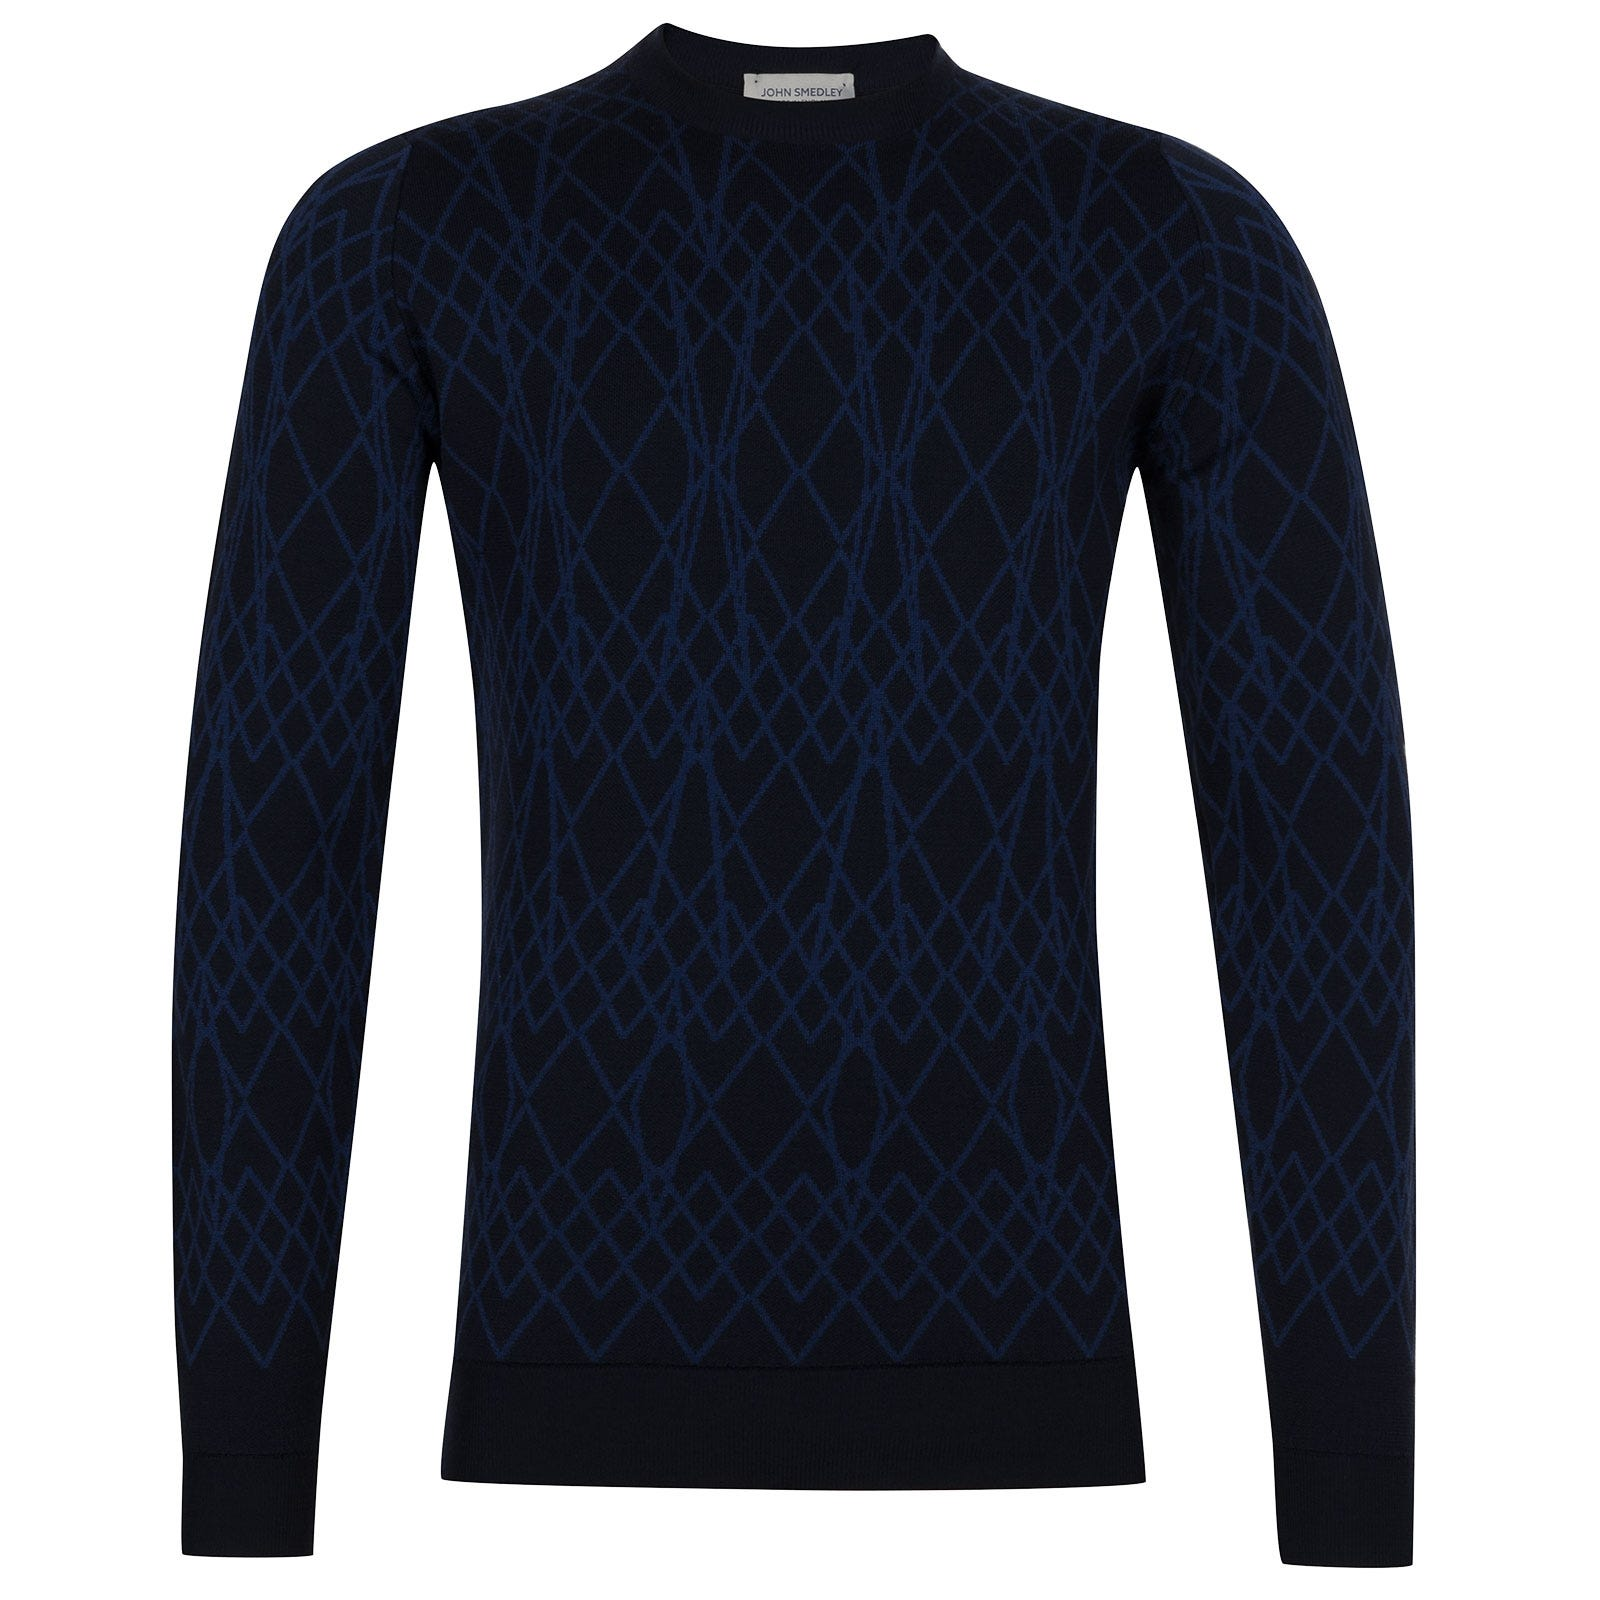 John Smedley Newton Extra Fine Merino Wool Pullover in Midnight-S